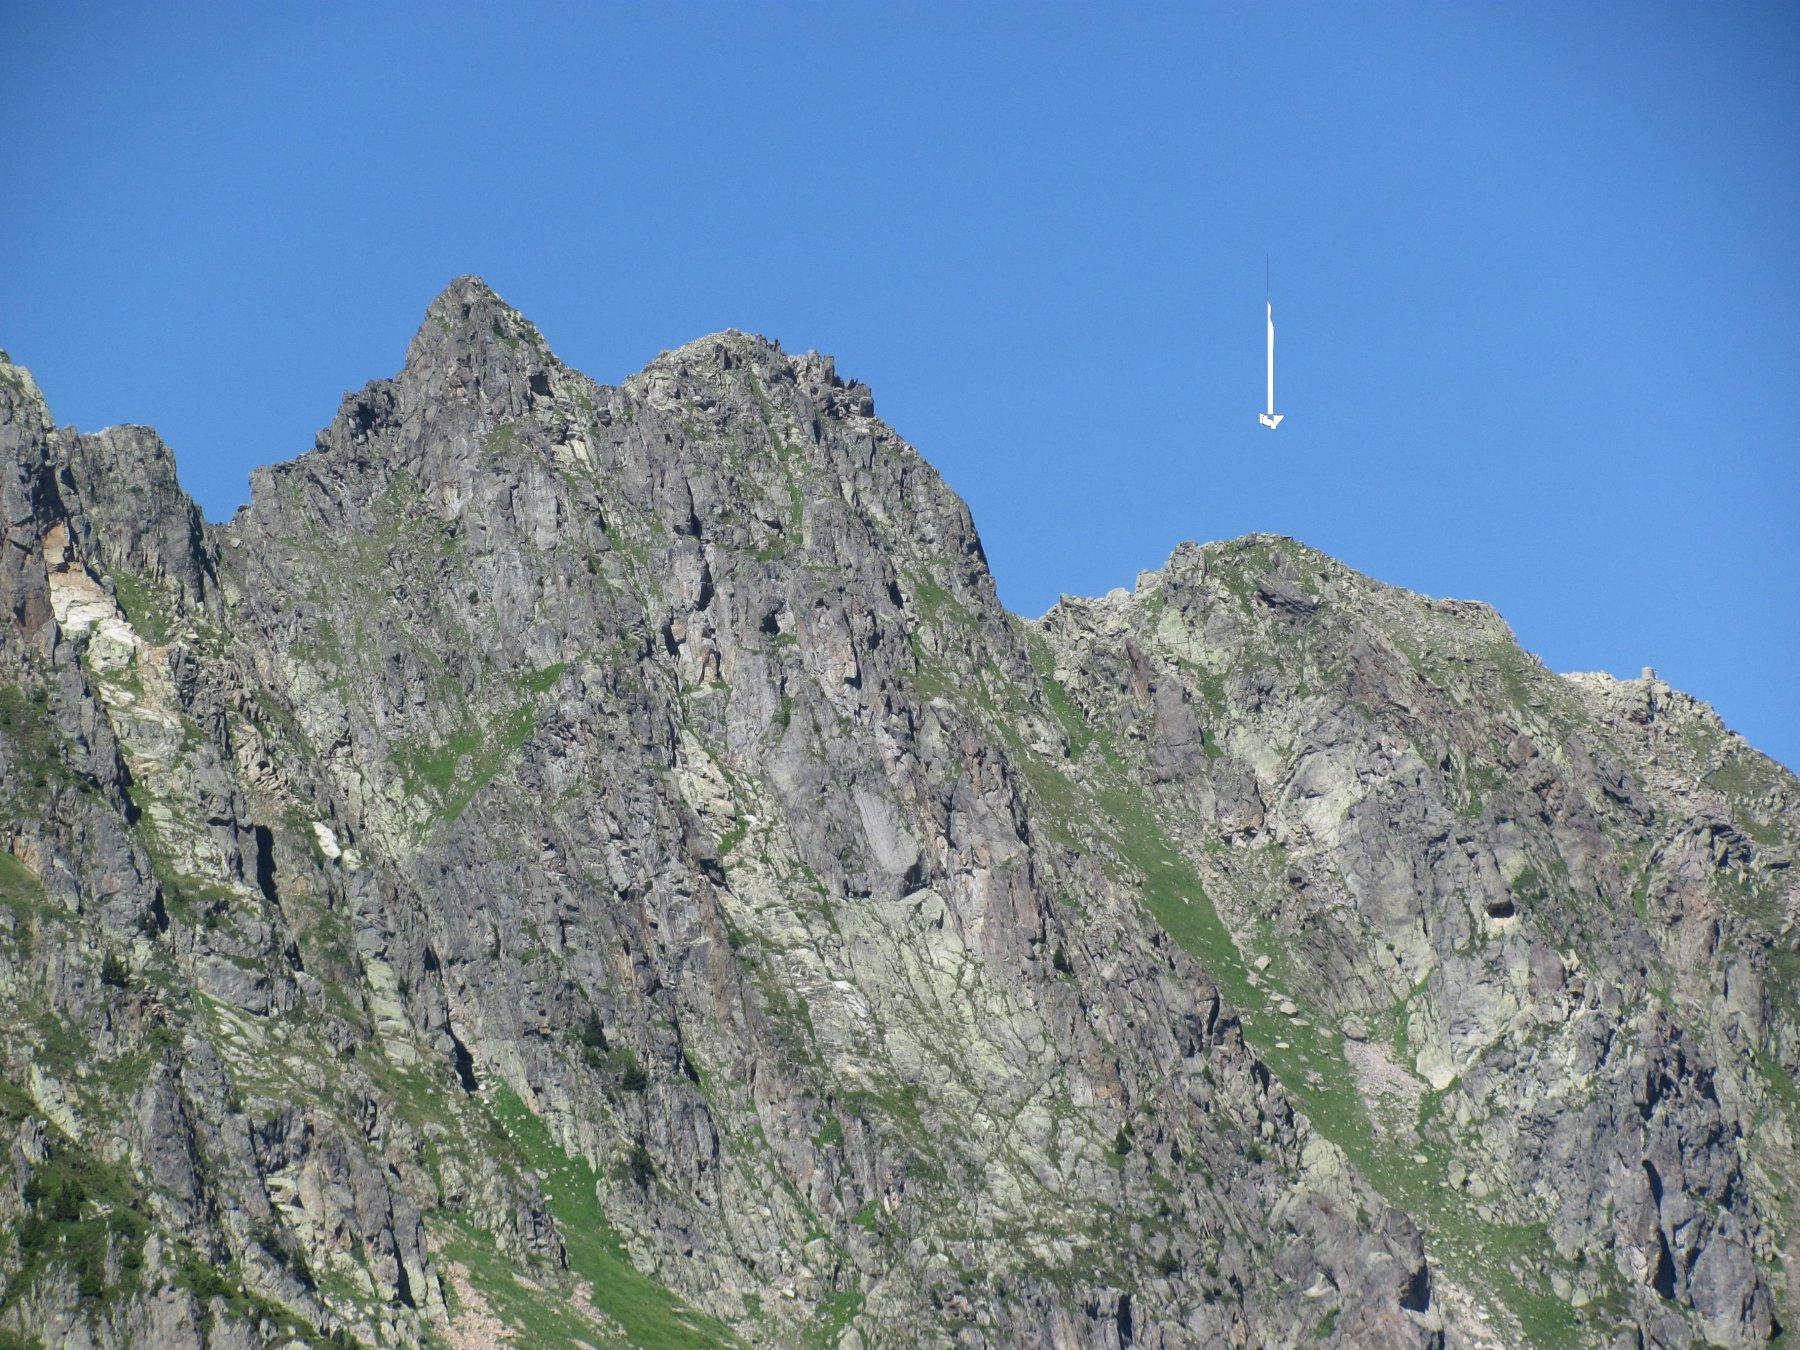 l'Aiguille de Charlanon, vista da Planpraz